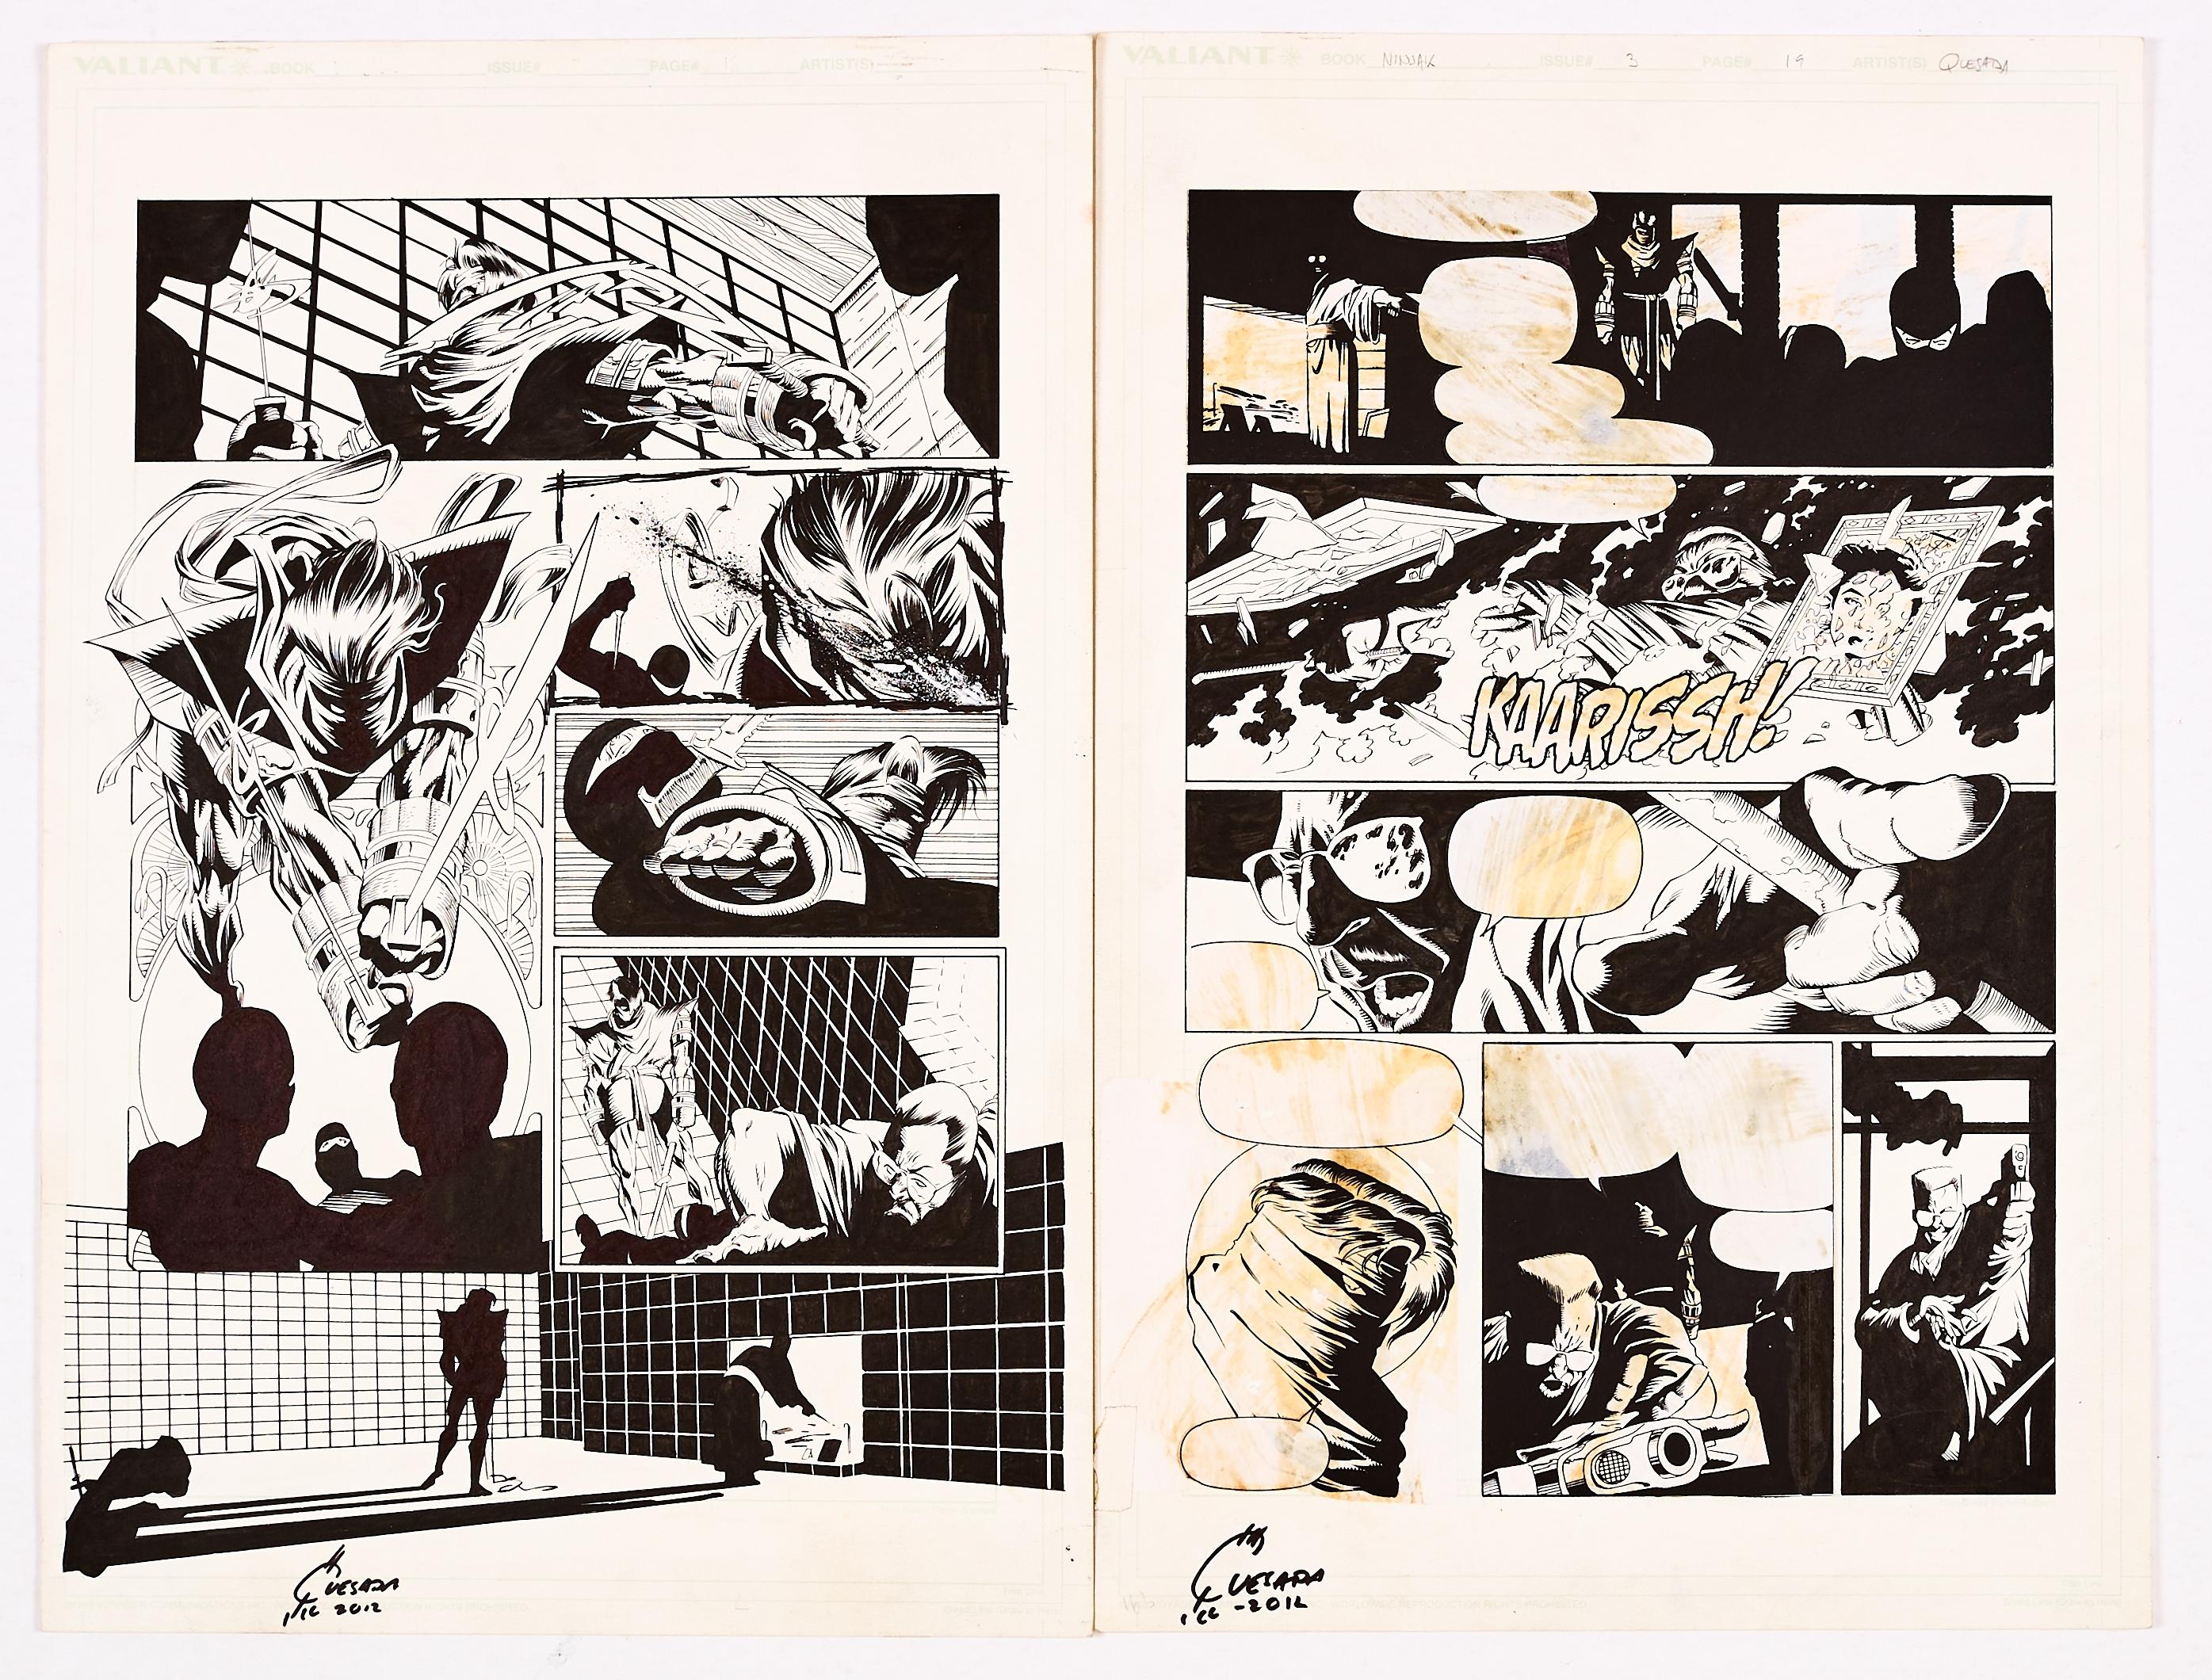 Lot 259 - Ninjak # 3 pgs 18 & 19 original artwork drawn and signed by Joe Quesada. Ninjak is recruited for a